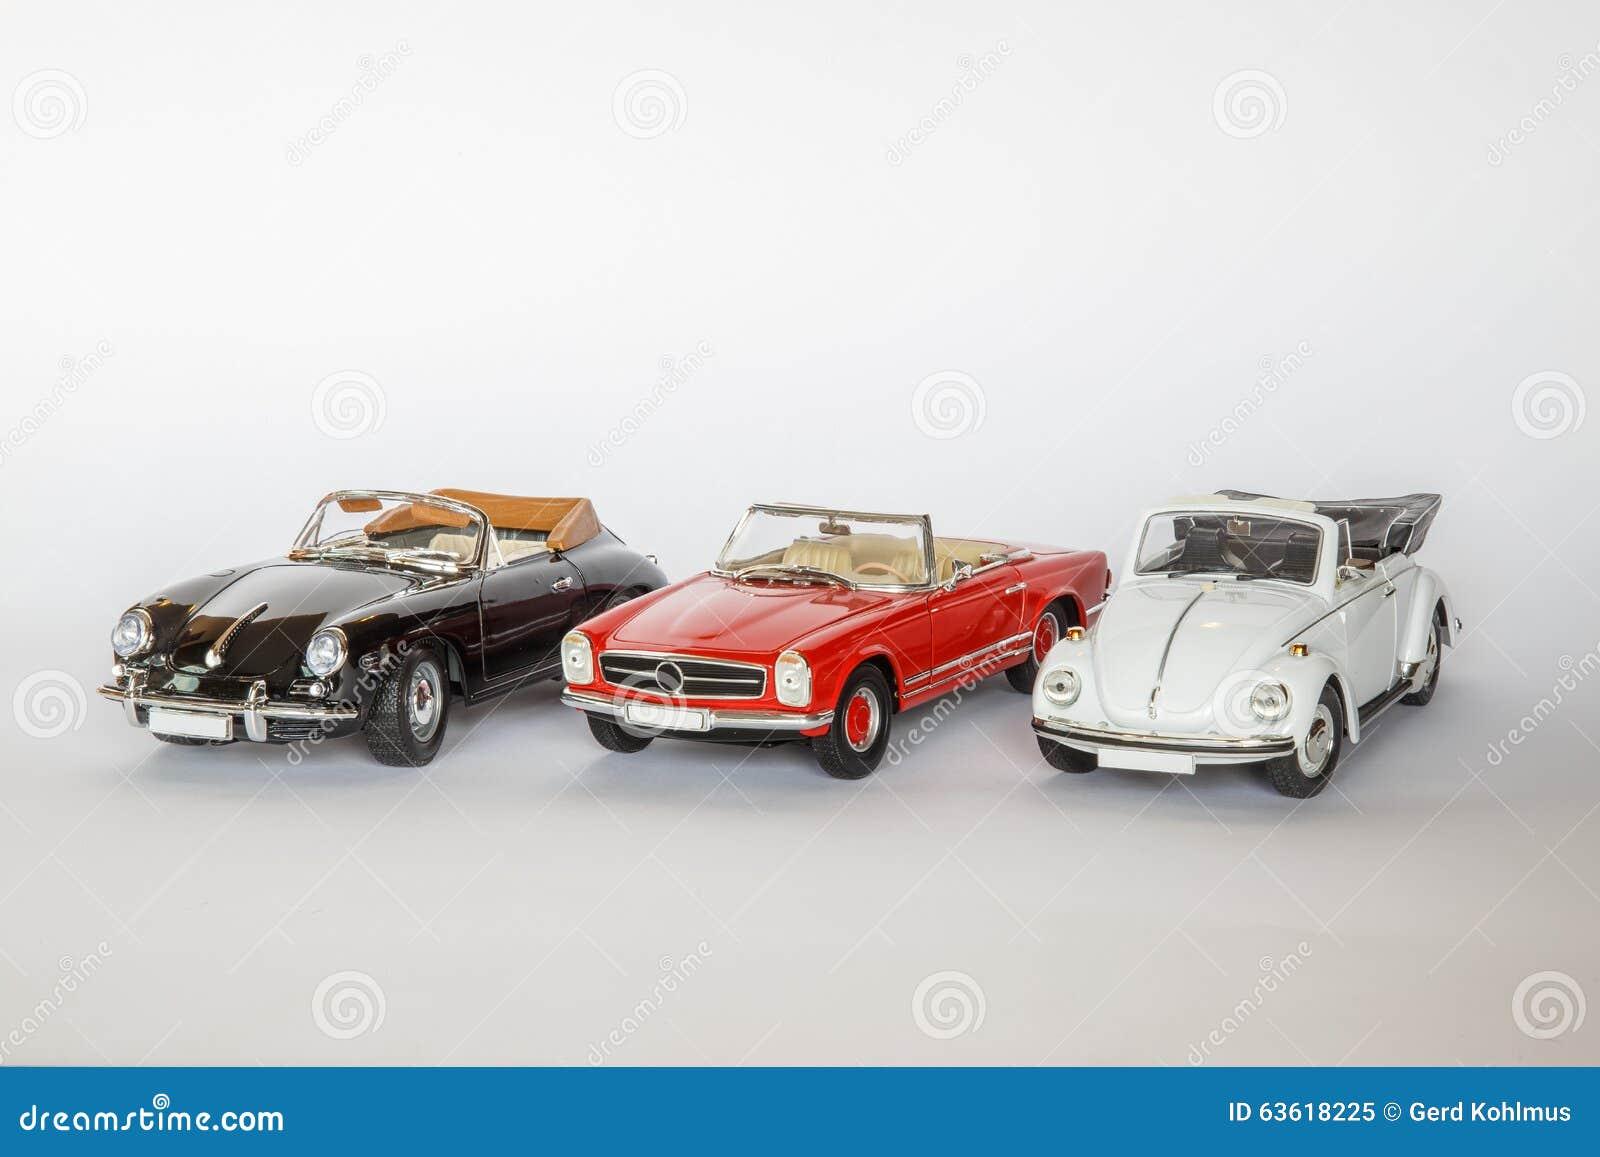 German automobile industry background essay